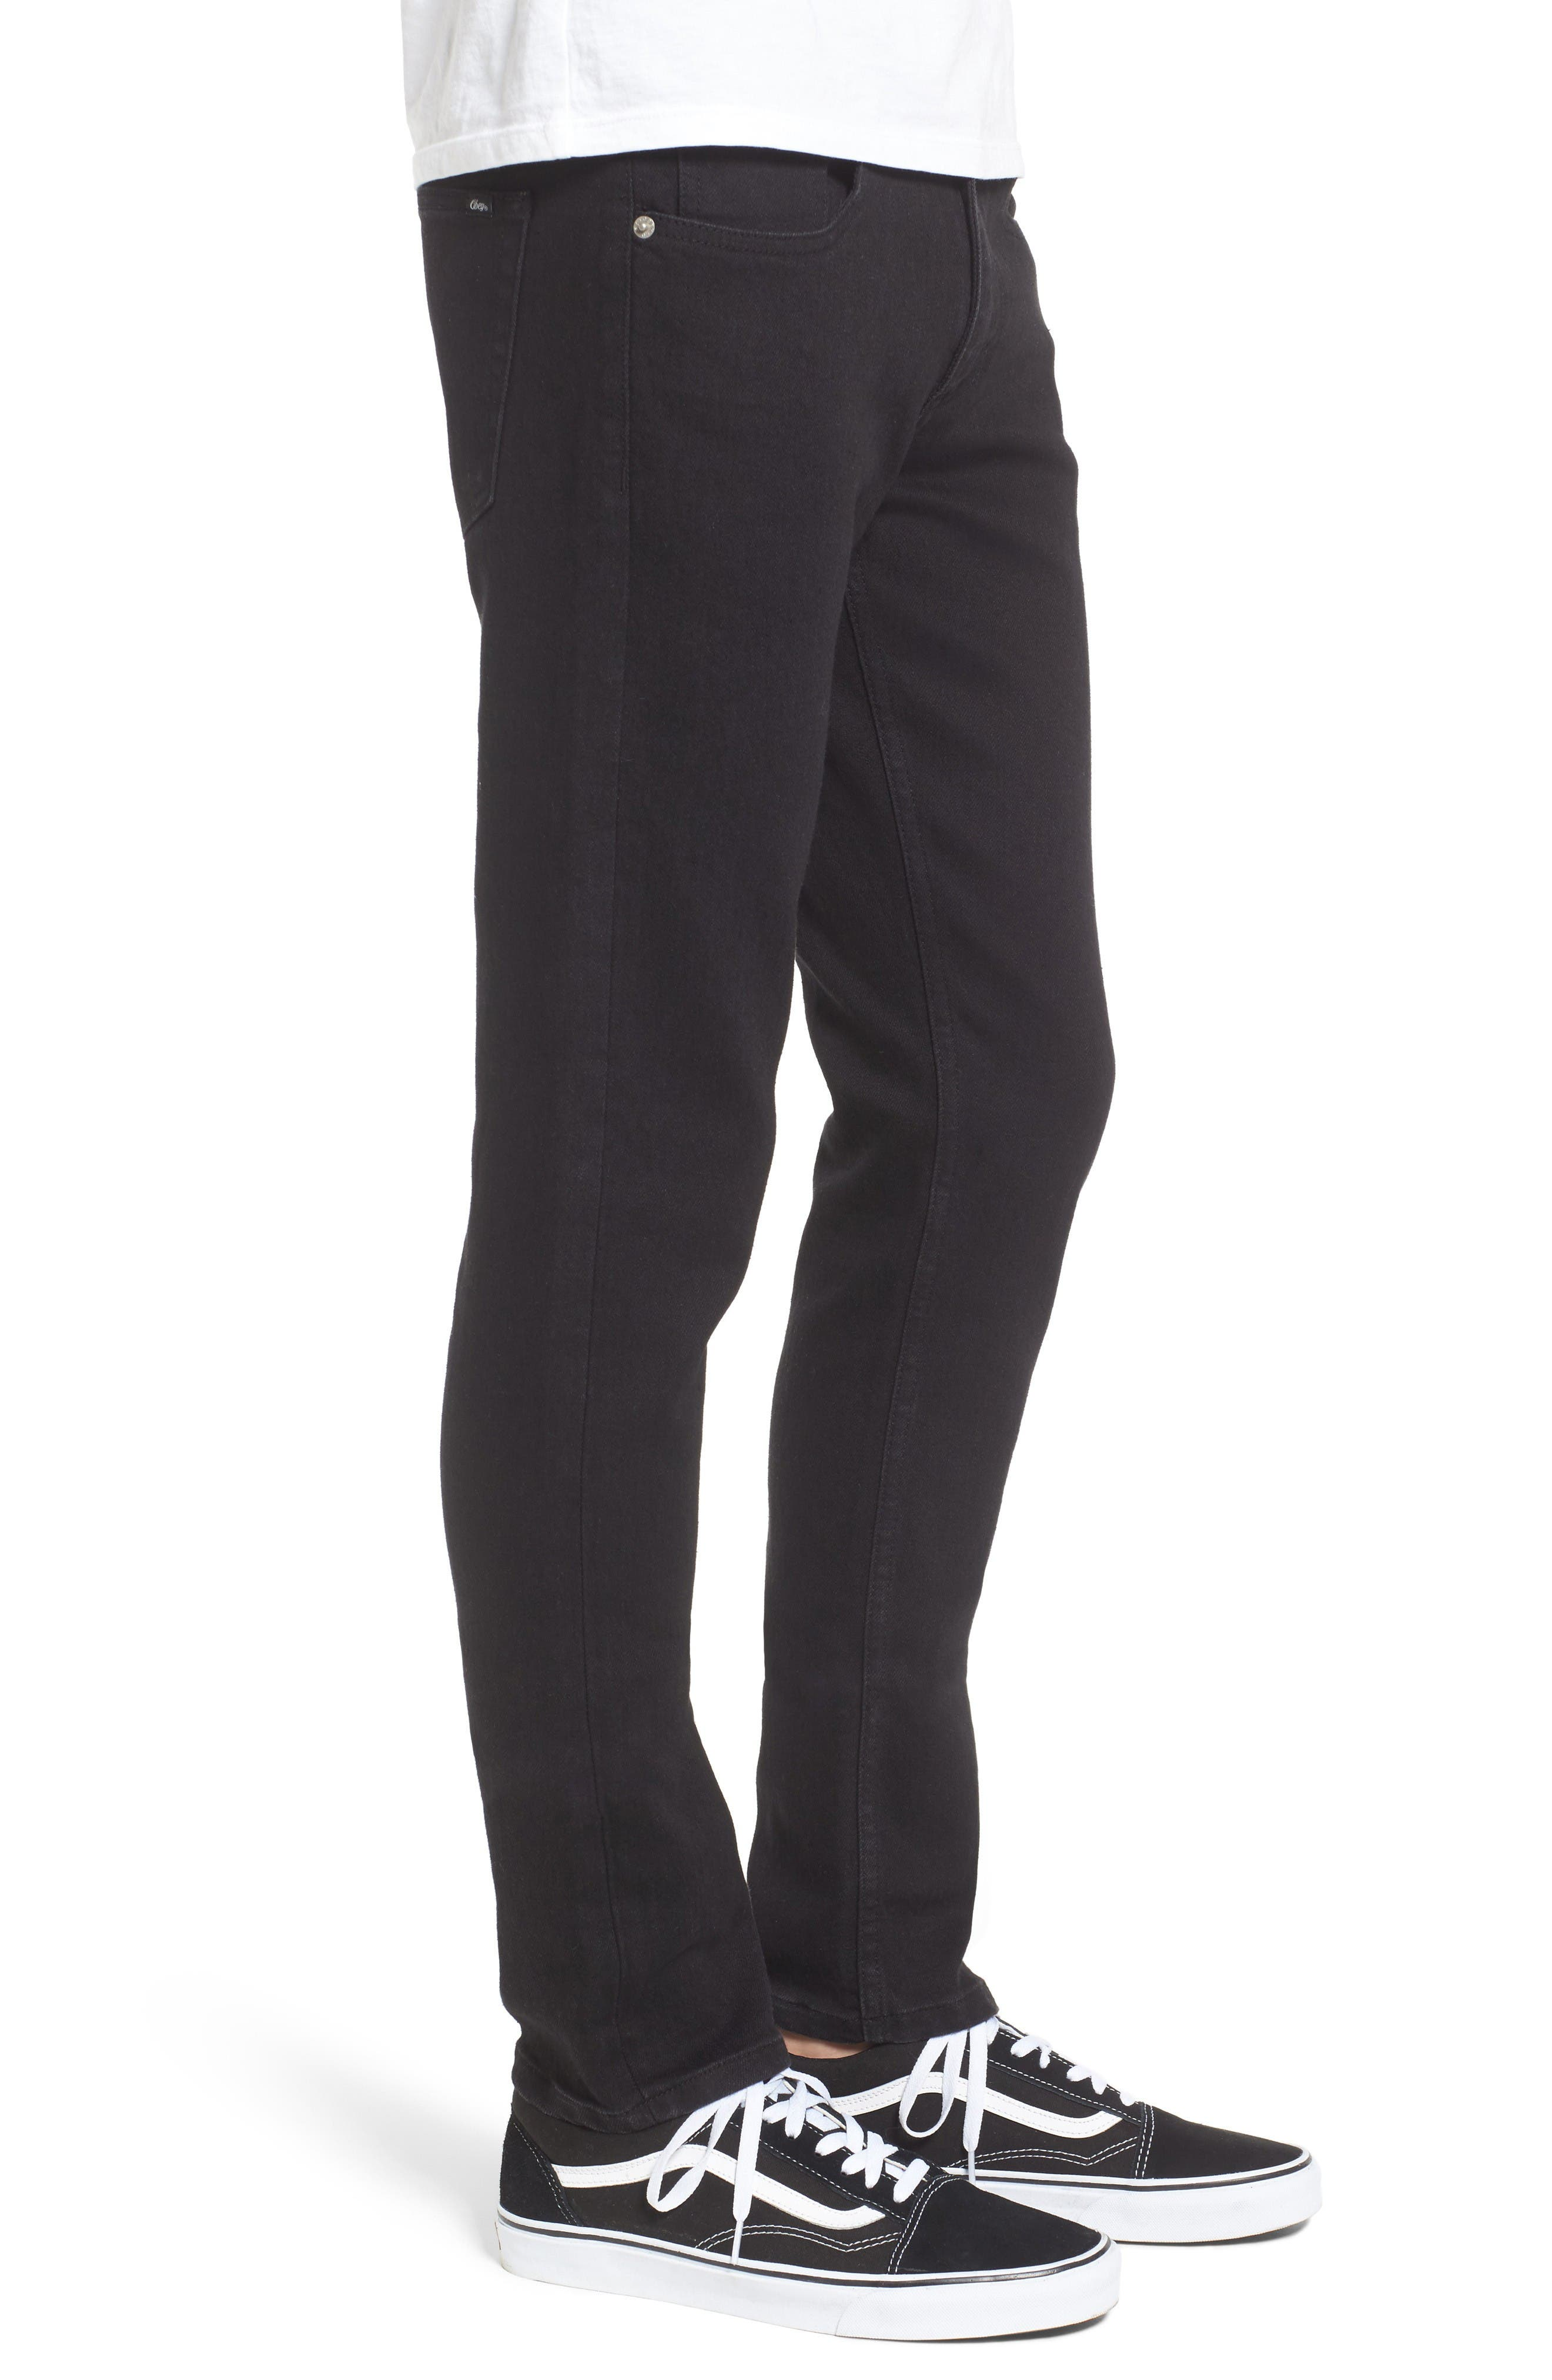 Juvee II Skinny Fit Jeans,                             Alternate thumbnail 3, color,                             Black